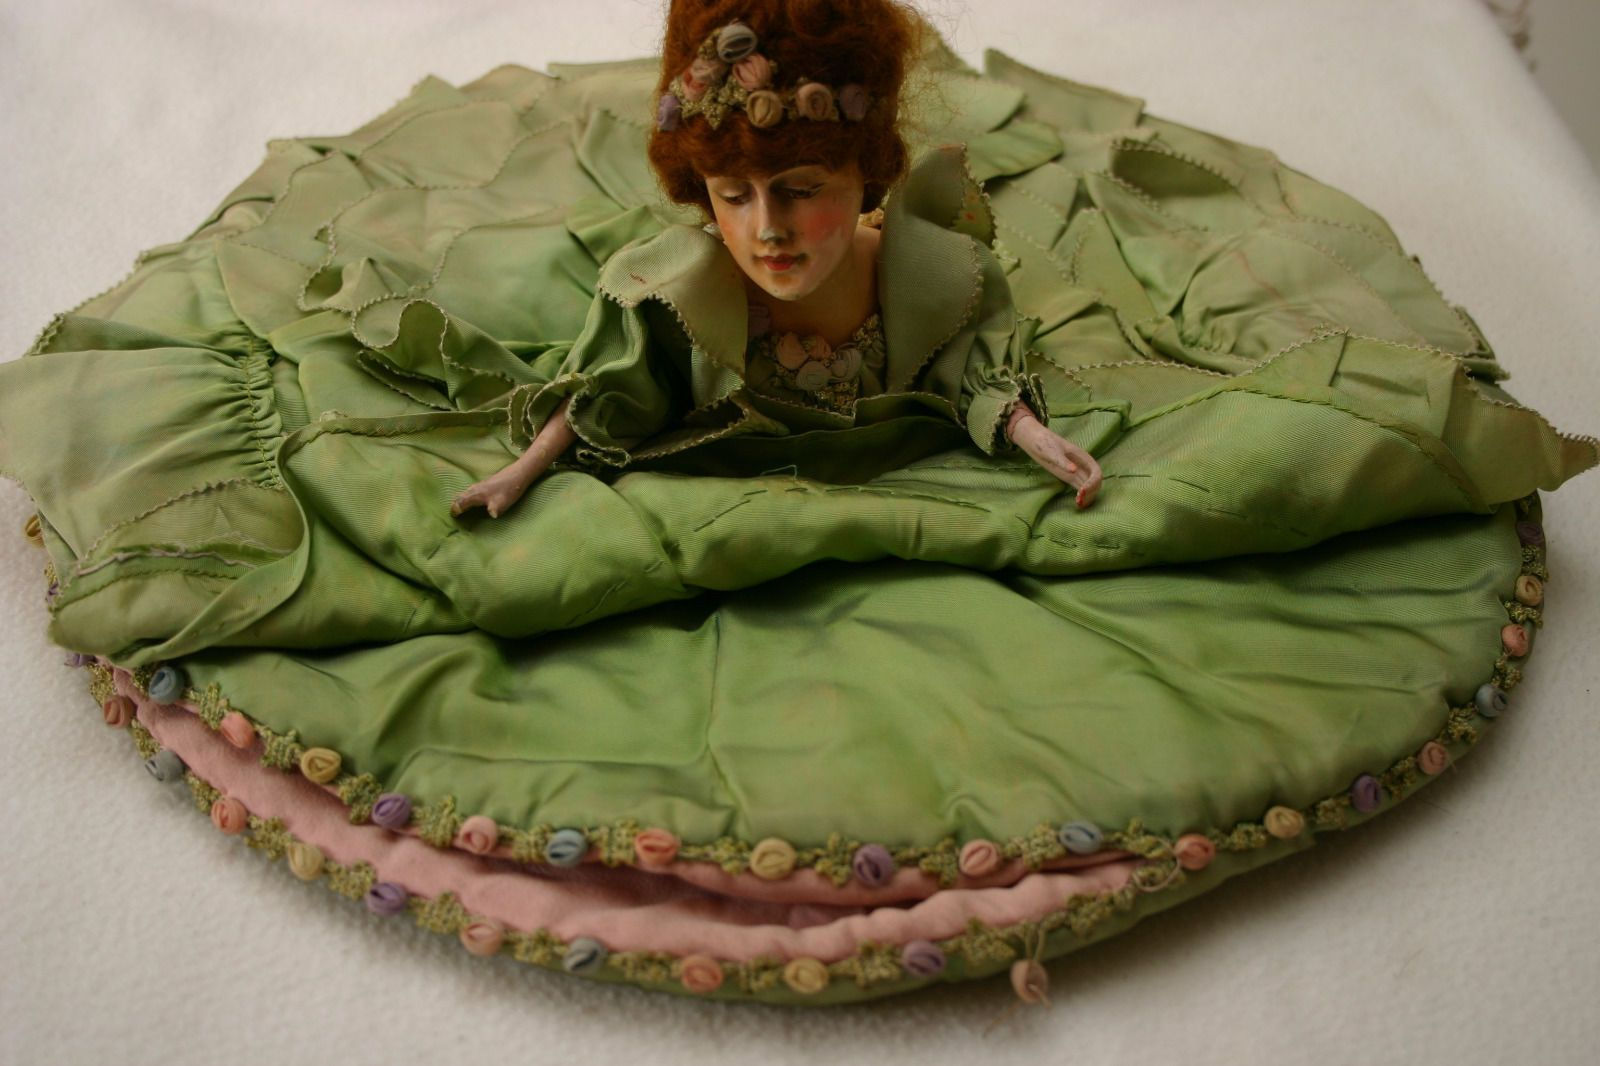 Vintage French Flapper 1920s 30s Half Doll Head Boudoir Nightdress Case | eBay